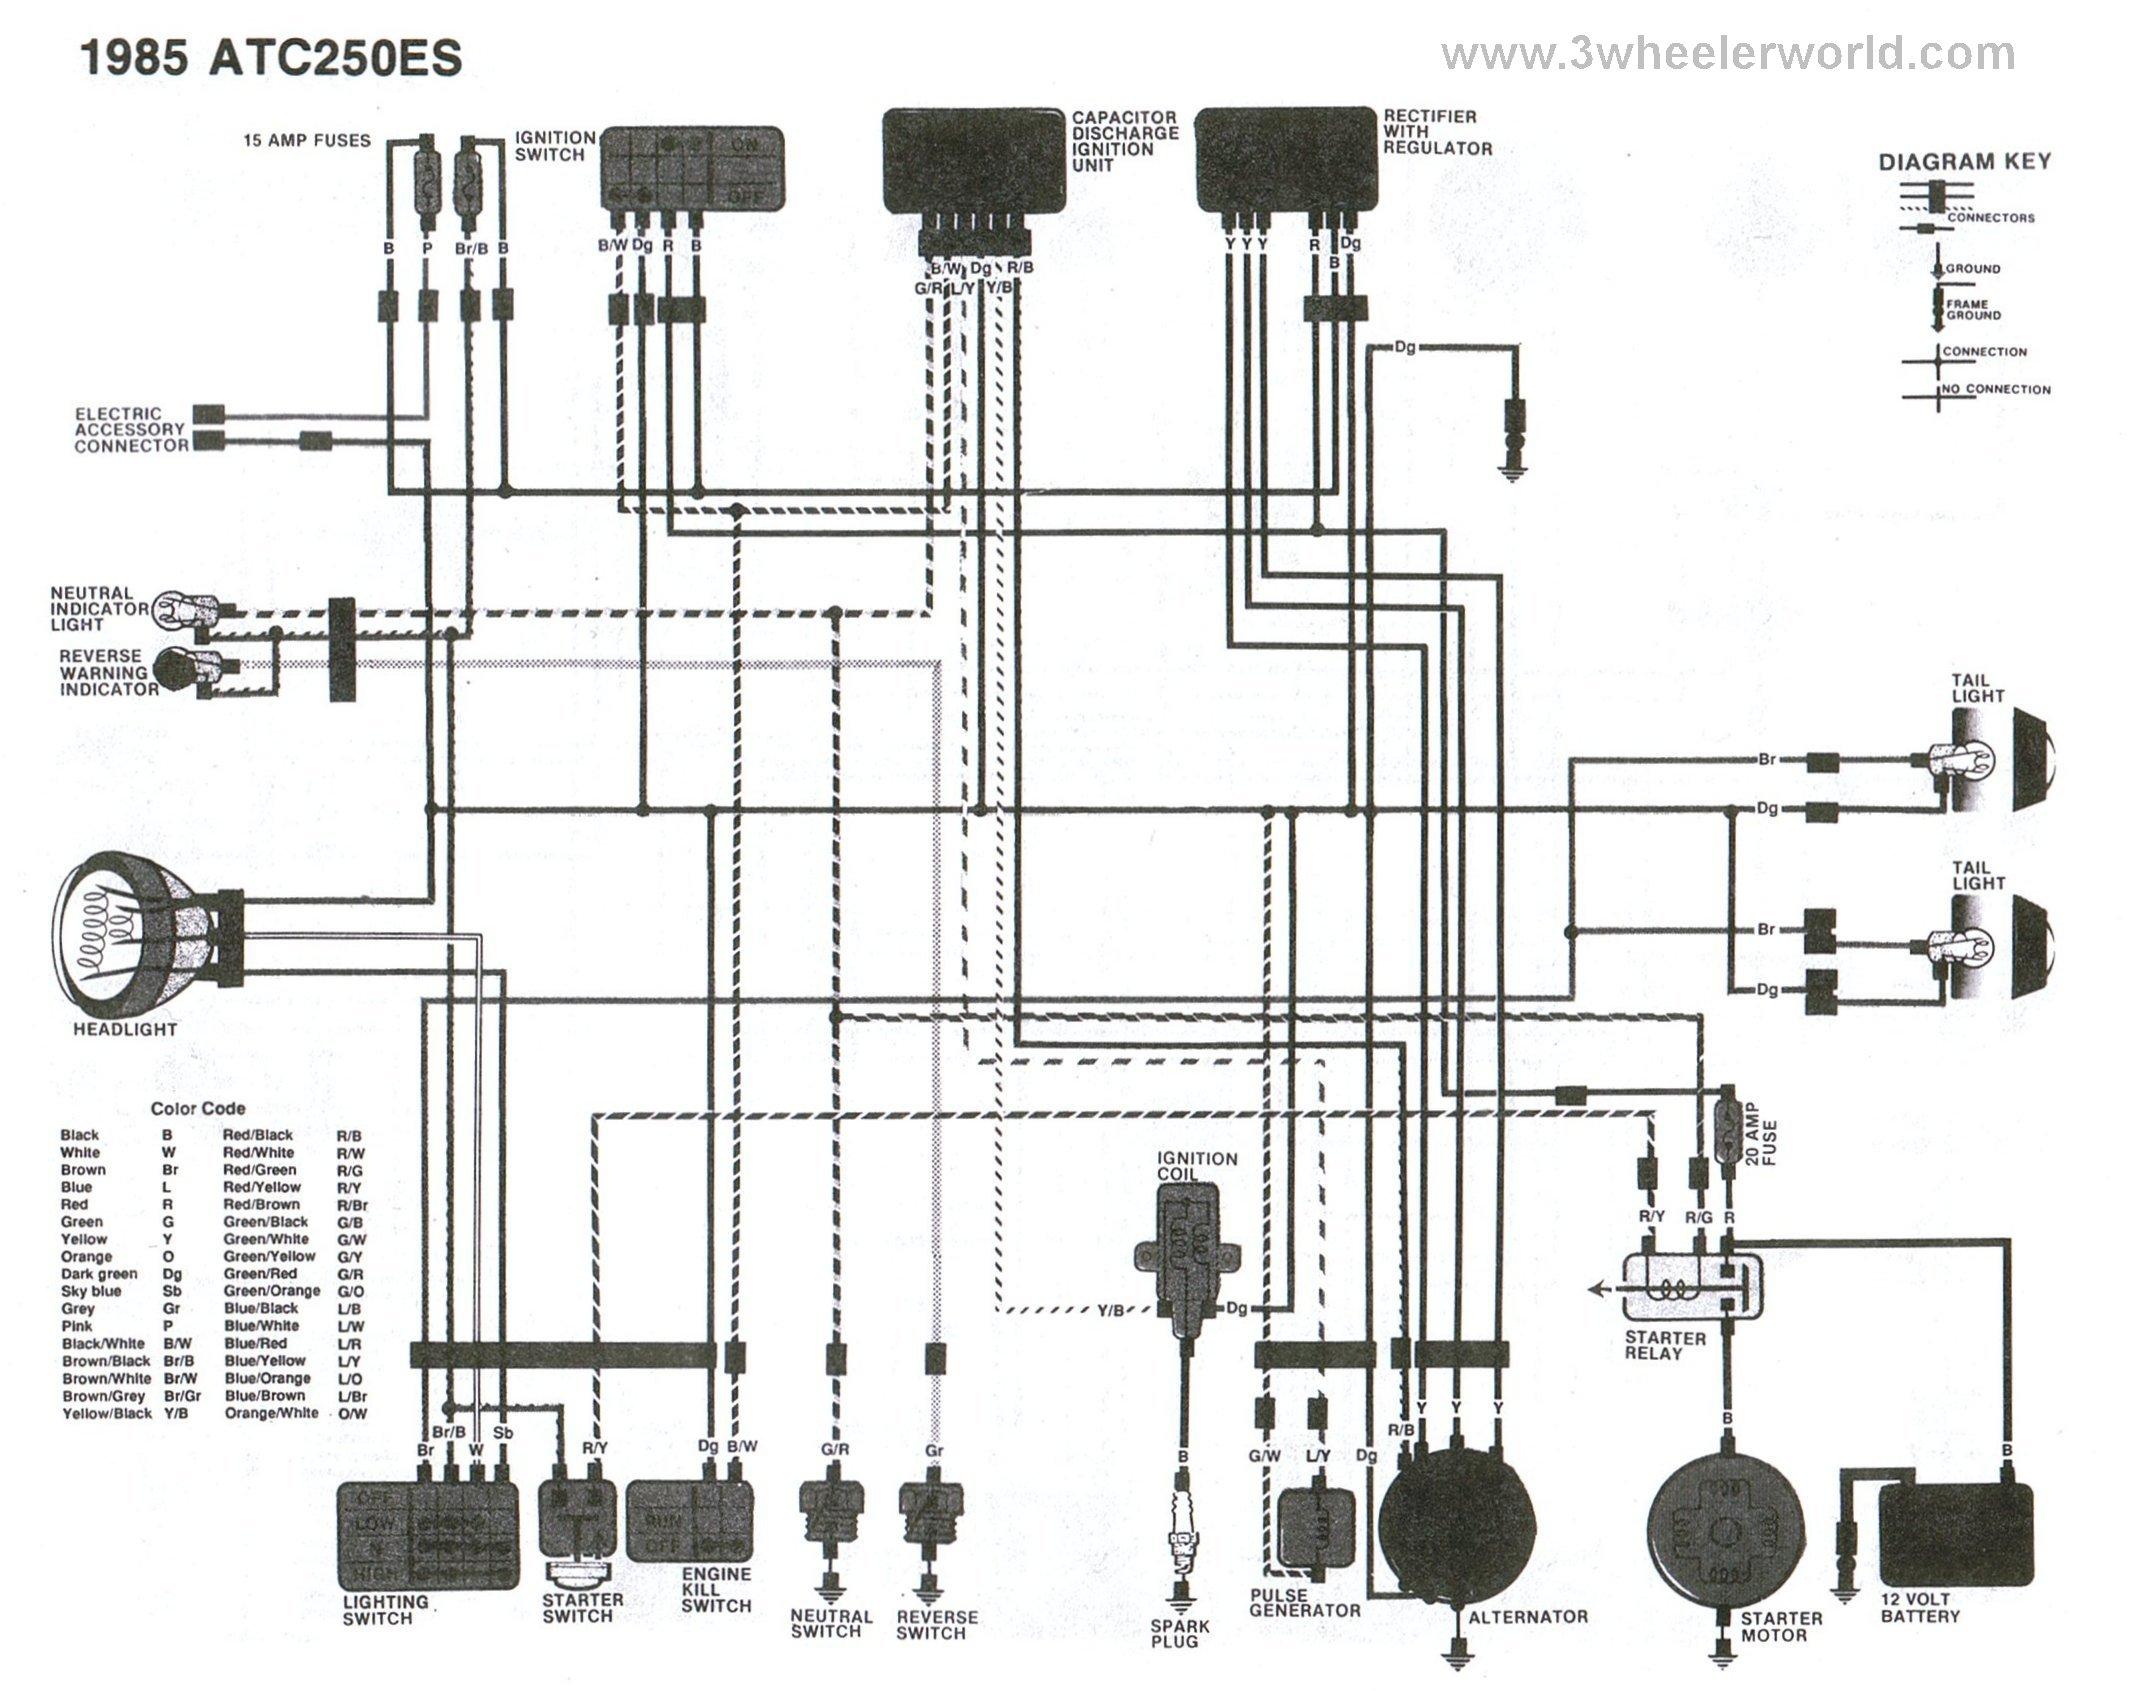 86 honda trx 125 wiring diagram honda 300 trx electrical